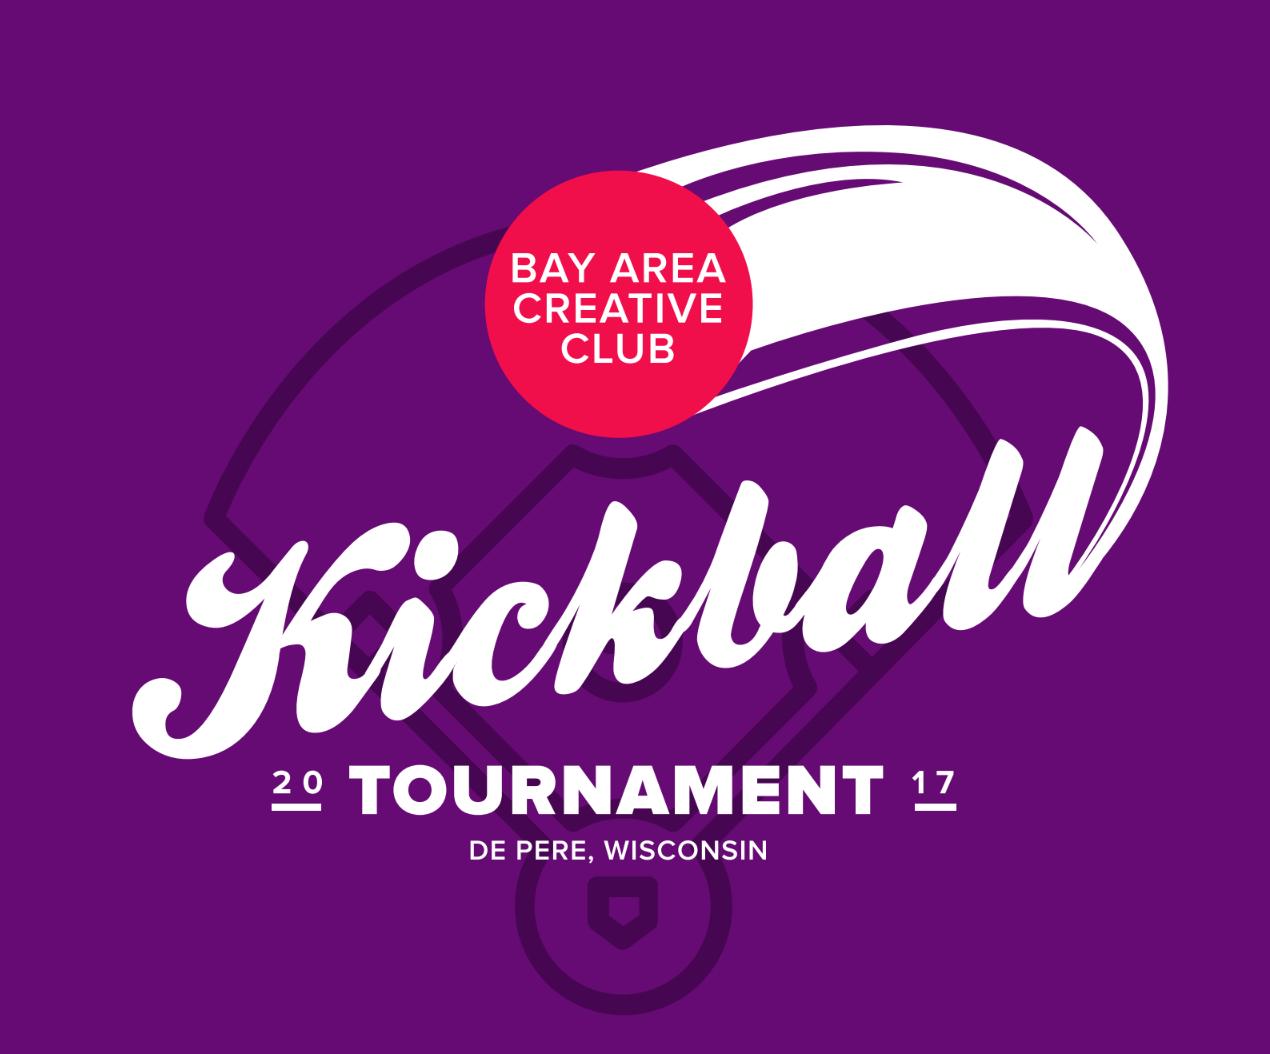 kickball tournament promotional graphic